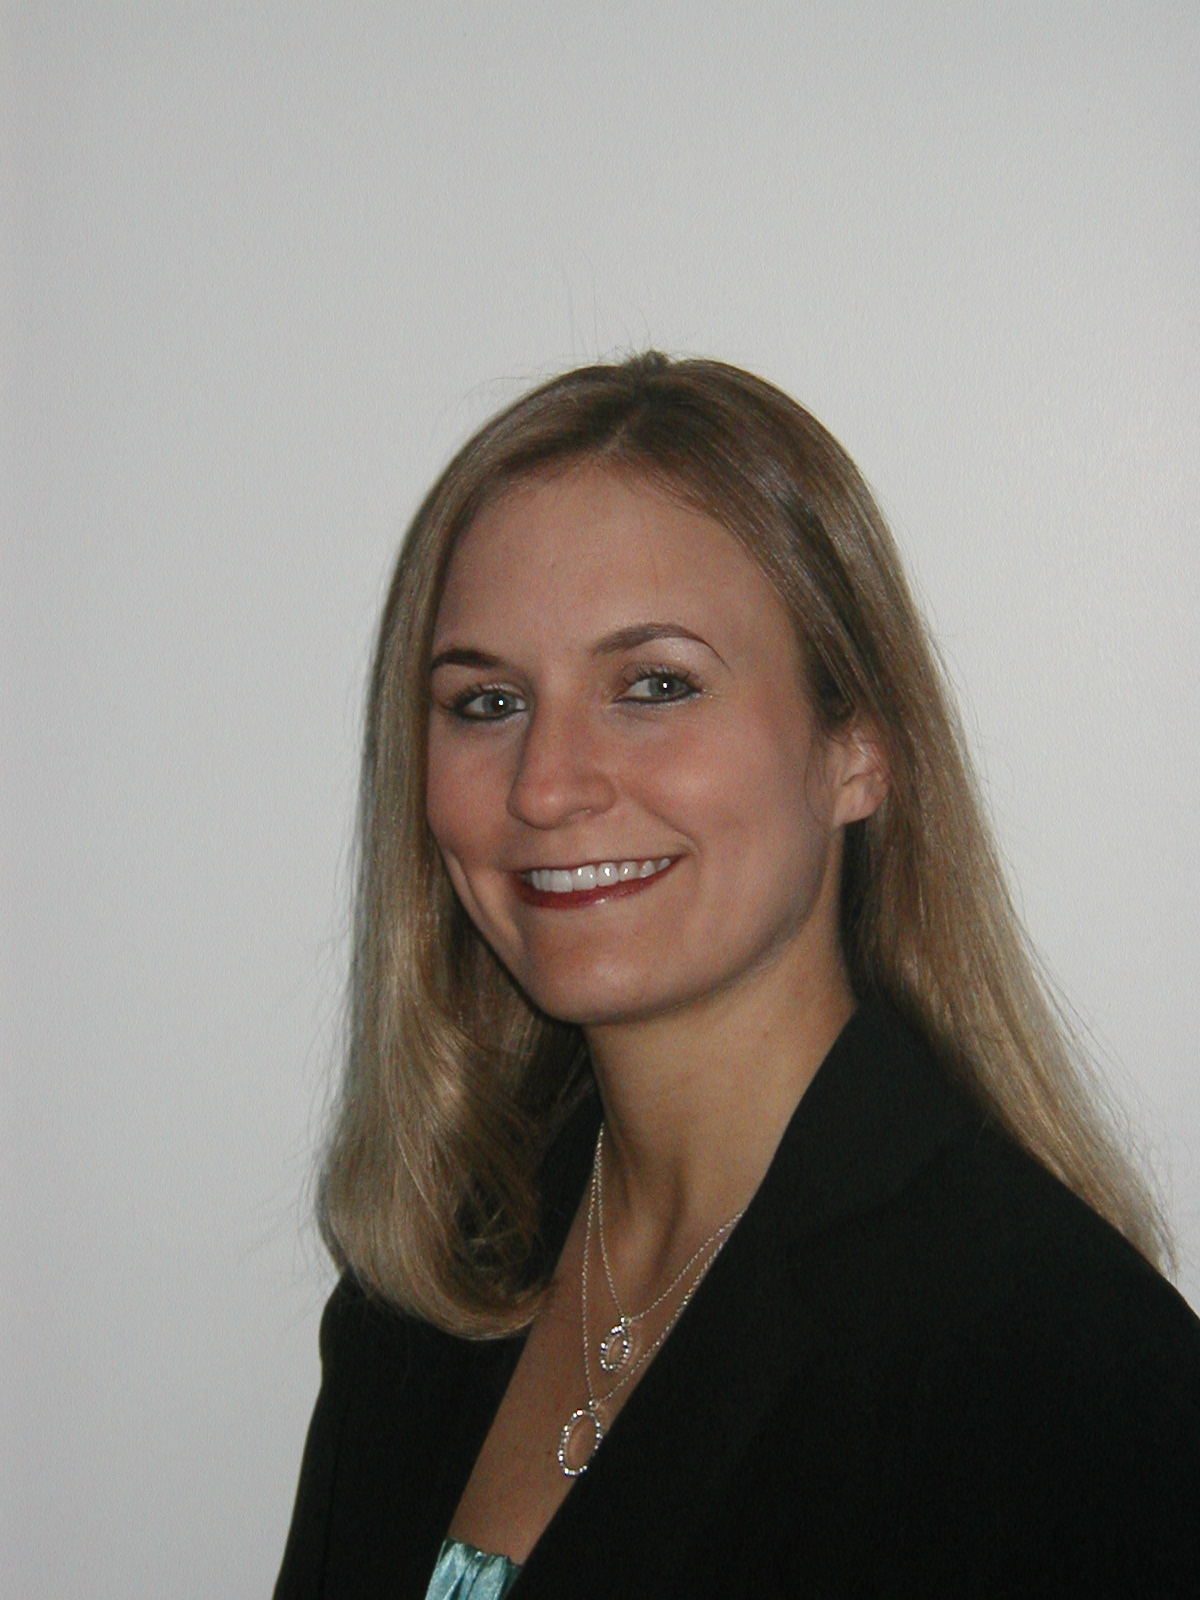 Stephanie Marberry, Ph.D.